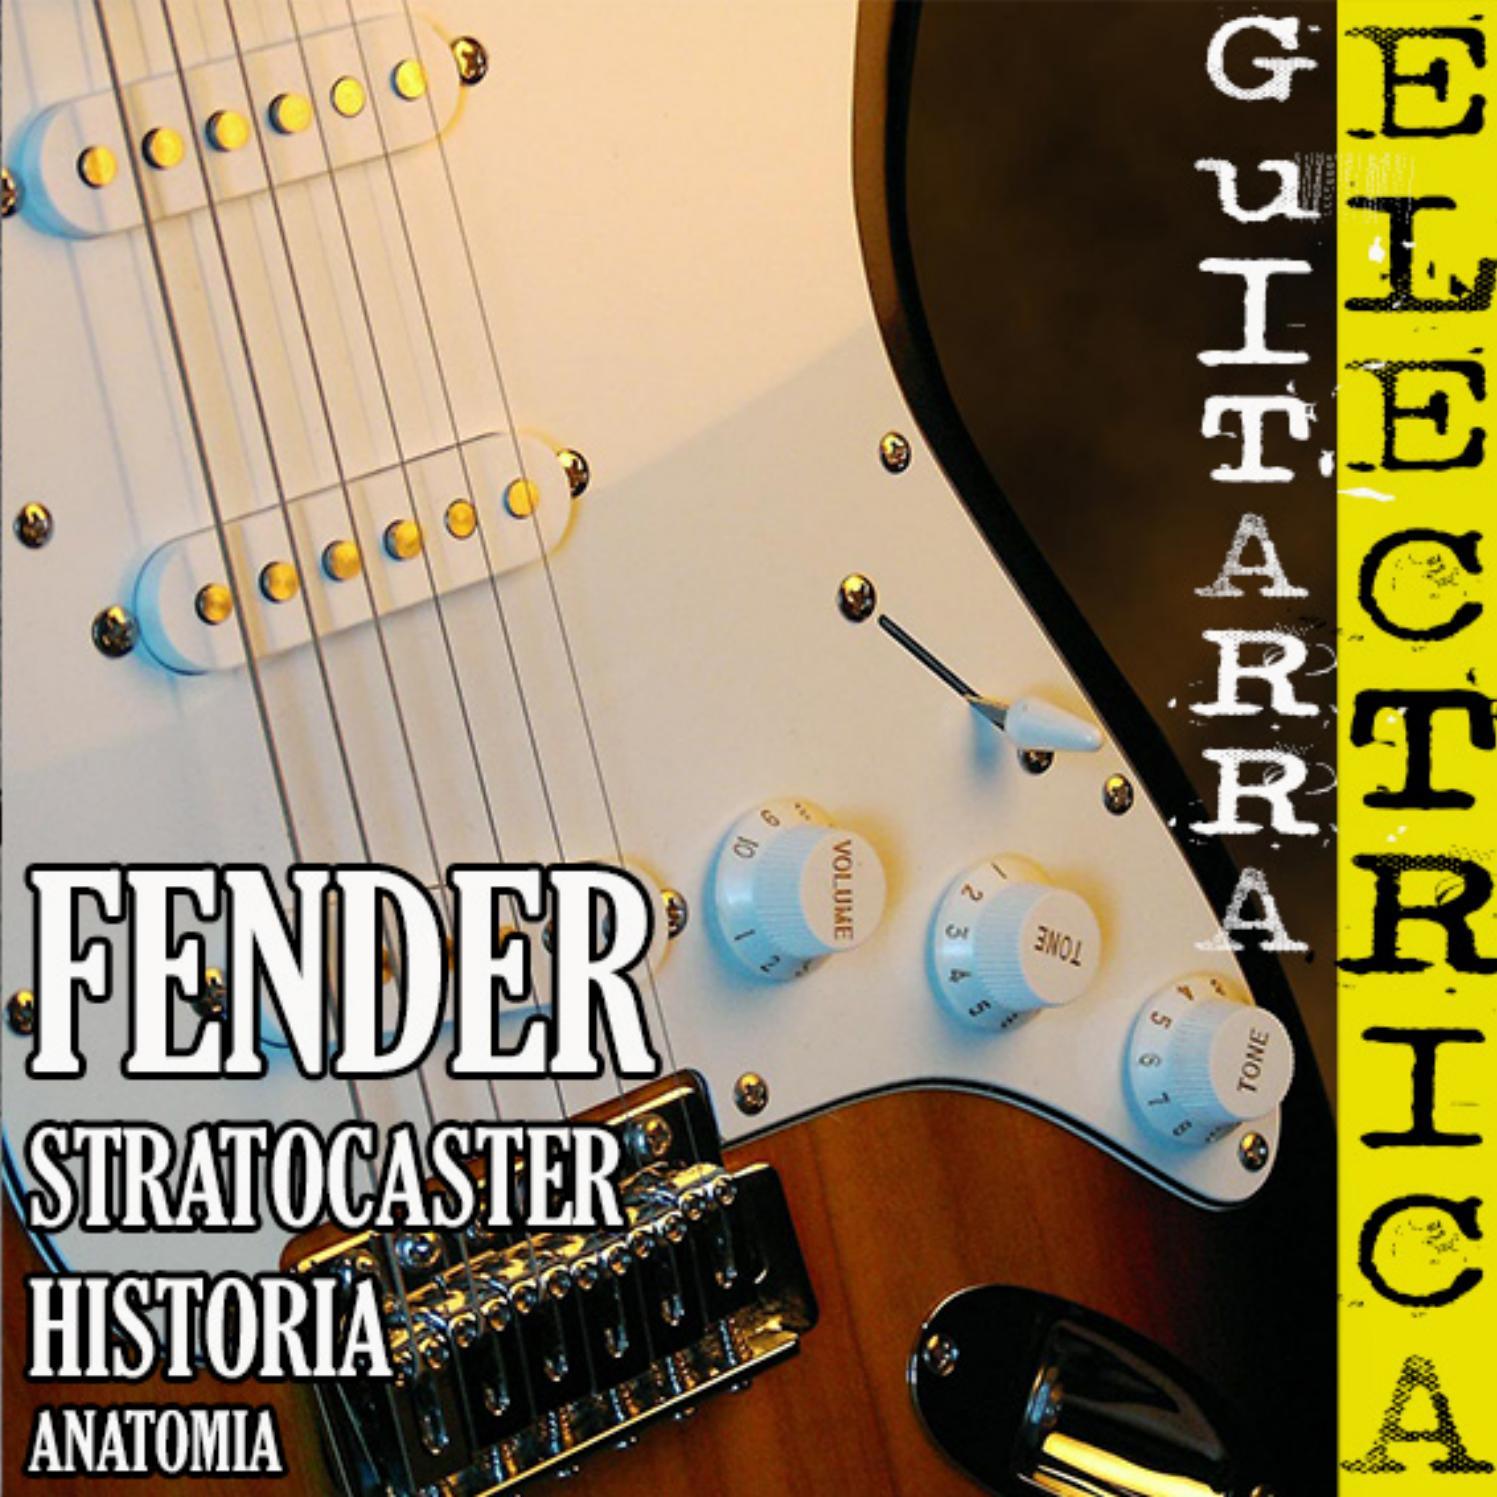 Fender revista by Odir Chacon - issuu